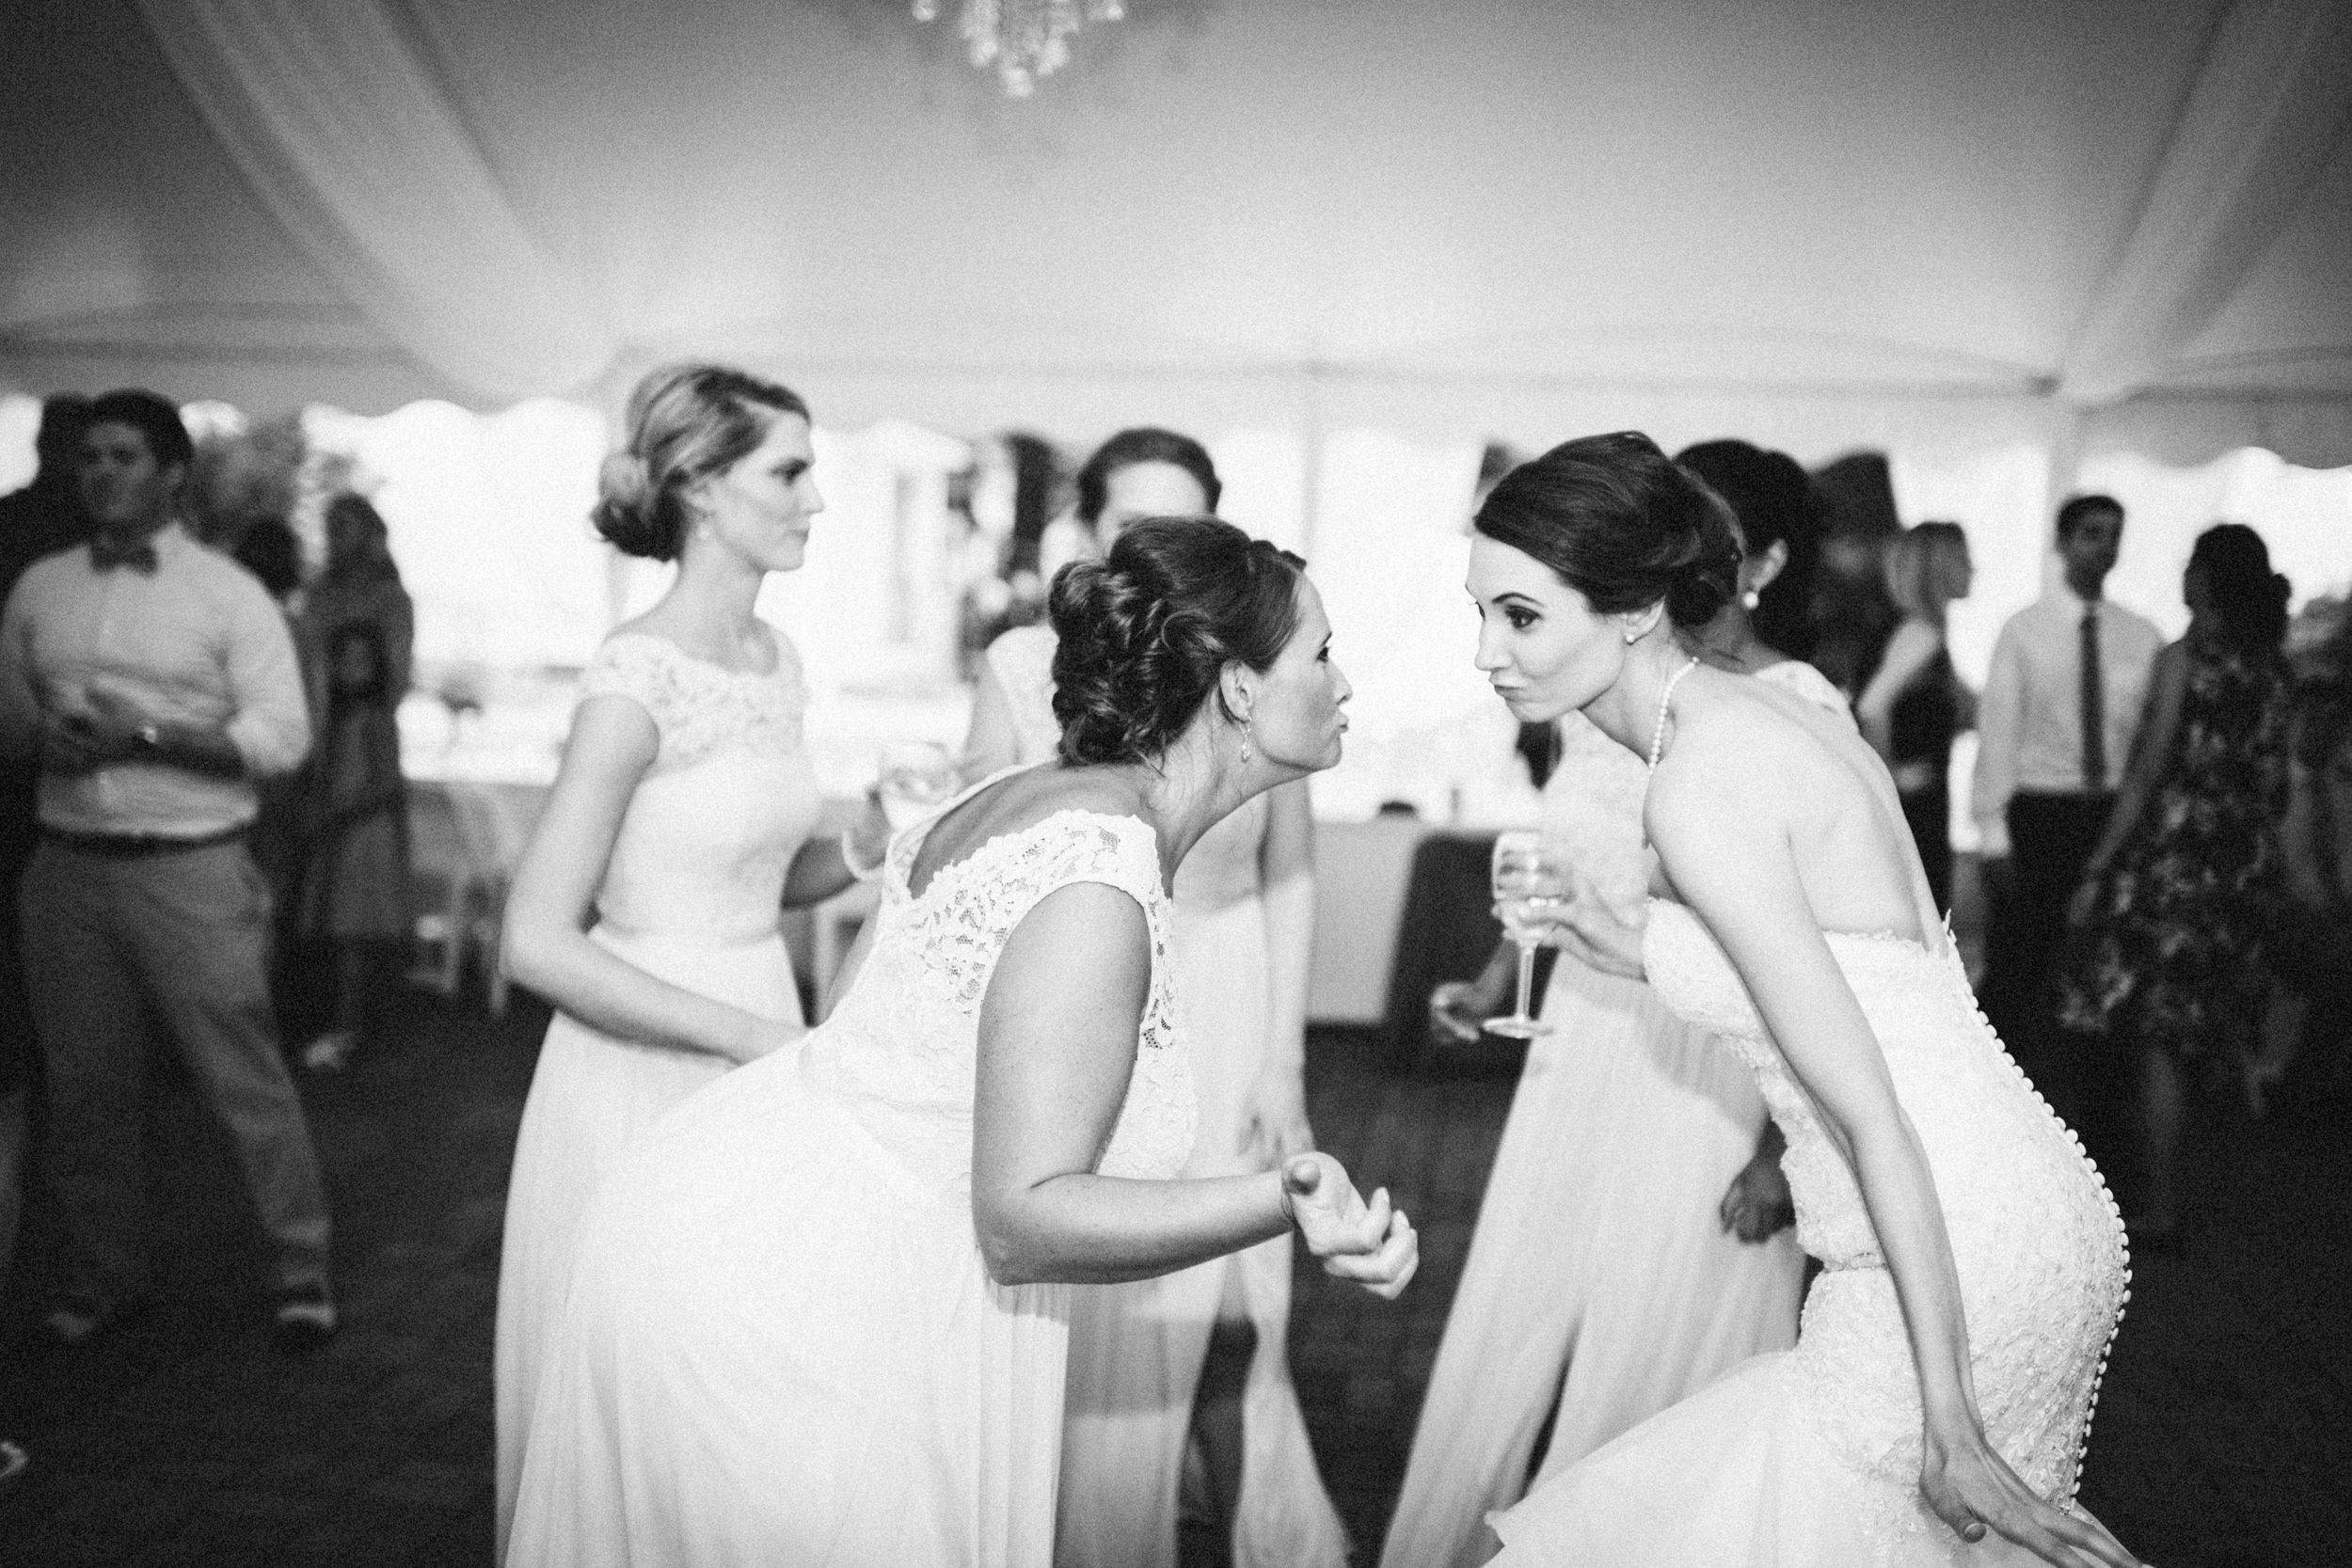 Louisville-Kentucky-Wedding-Elopement-Photographer-Sarah-Katherine-Davis-Photography-Whitehall-Classic-Timeless-Garden-Wedding-797.jpg